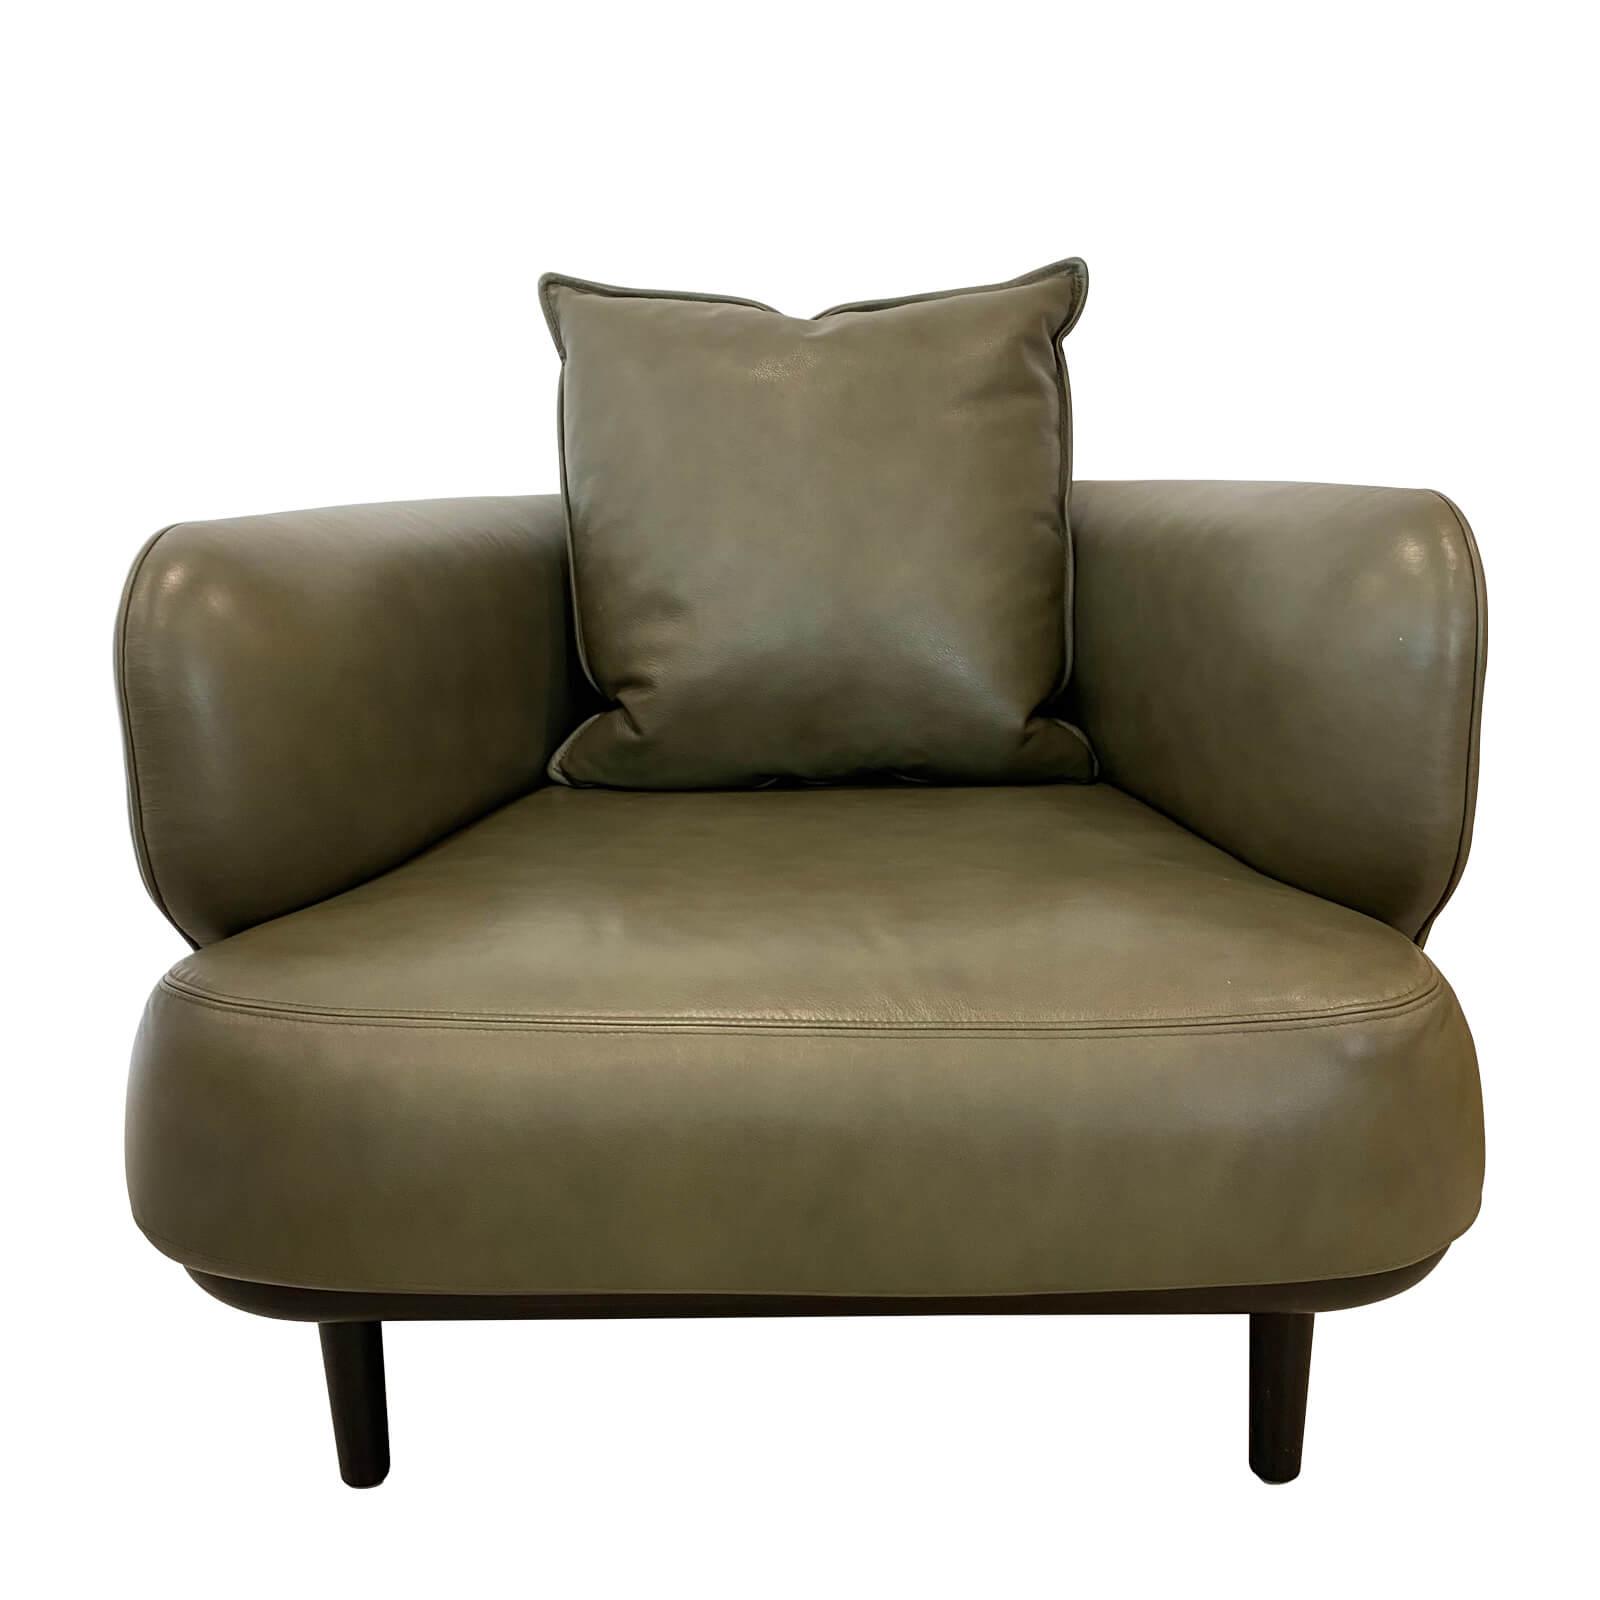 Cosh Living - Johanna occasional chair